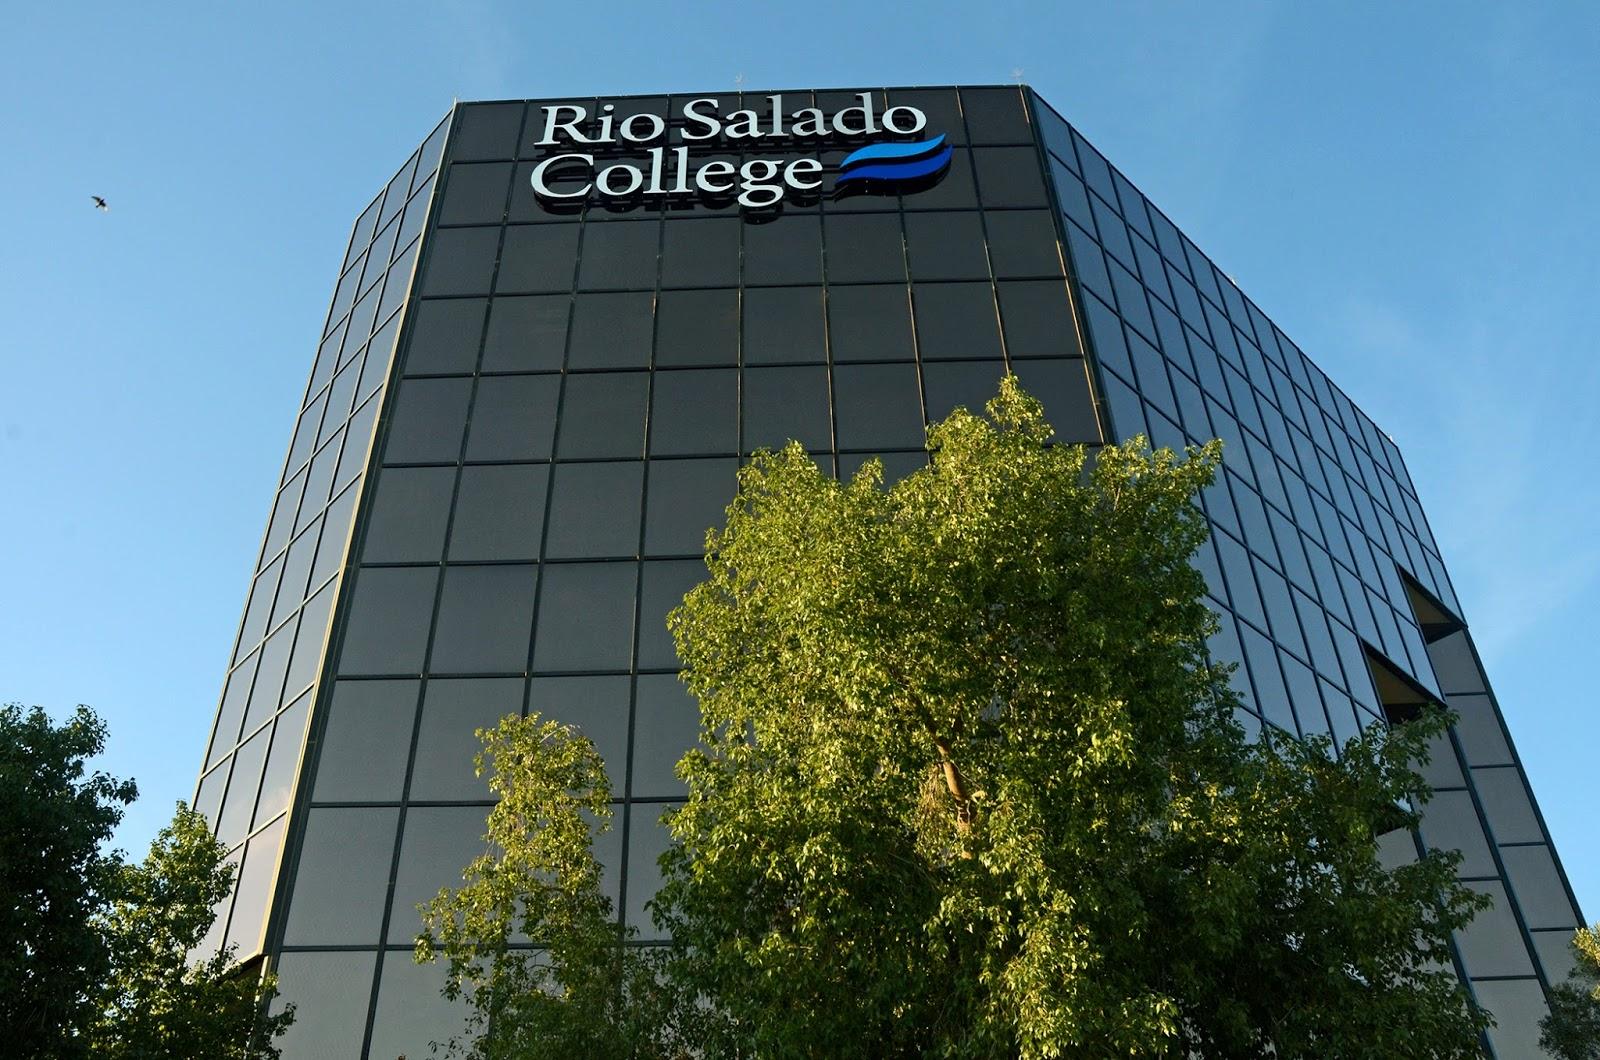 Rio Salado College 67